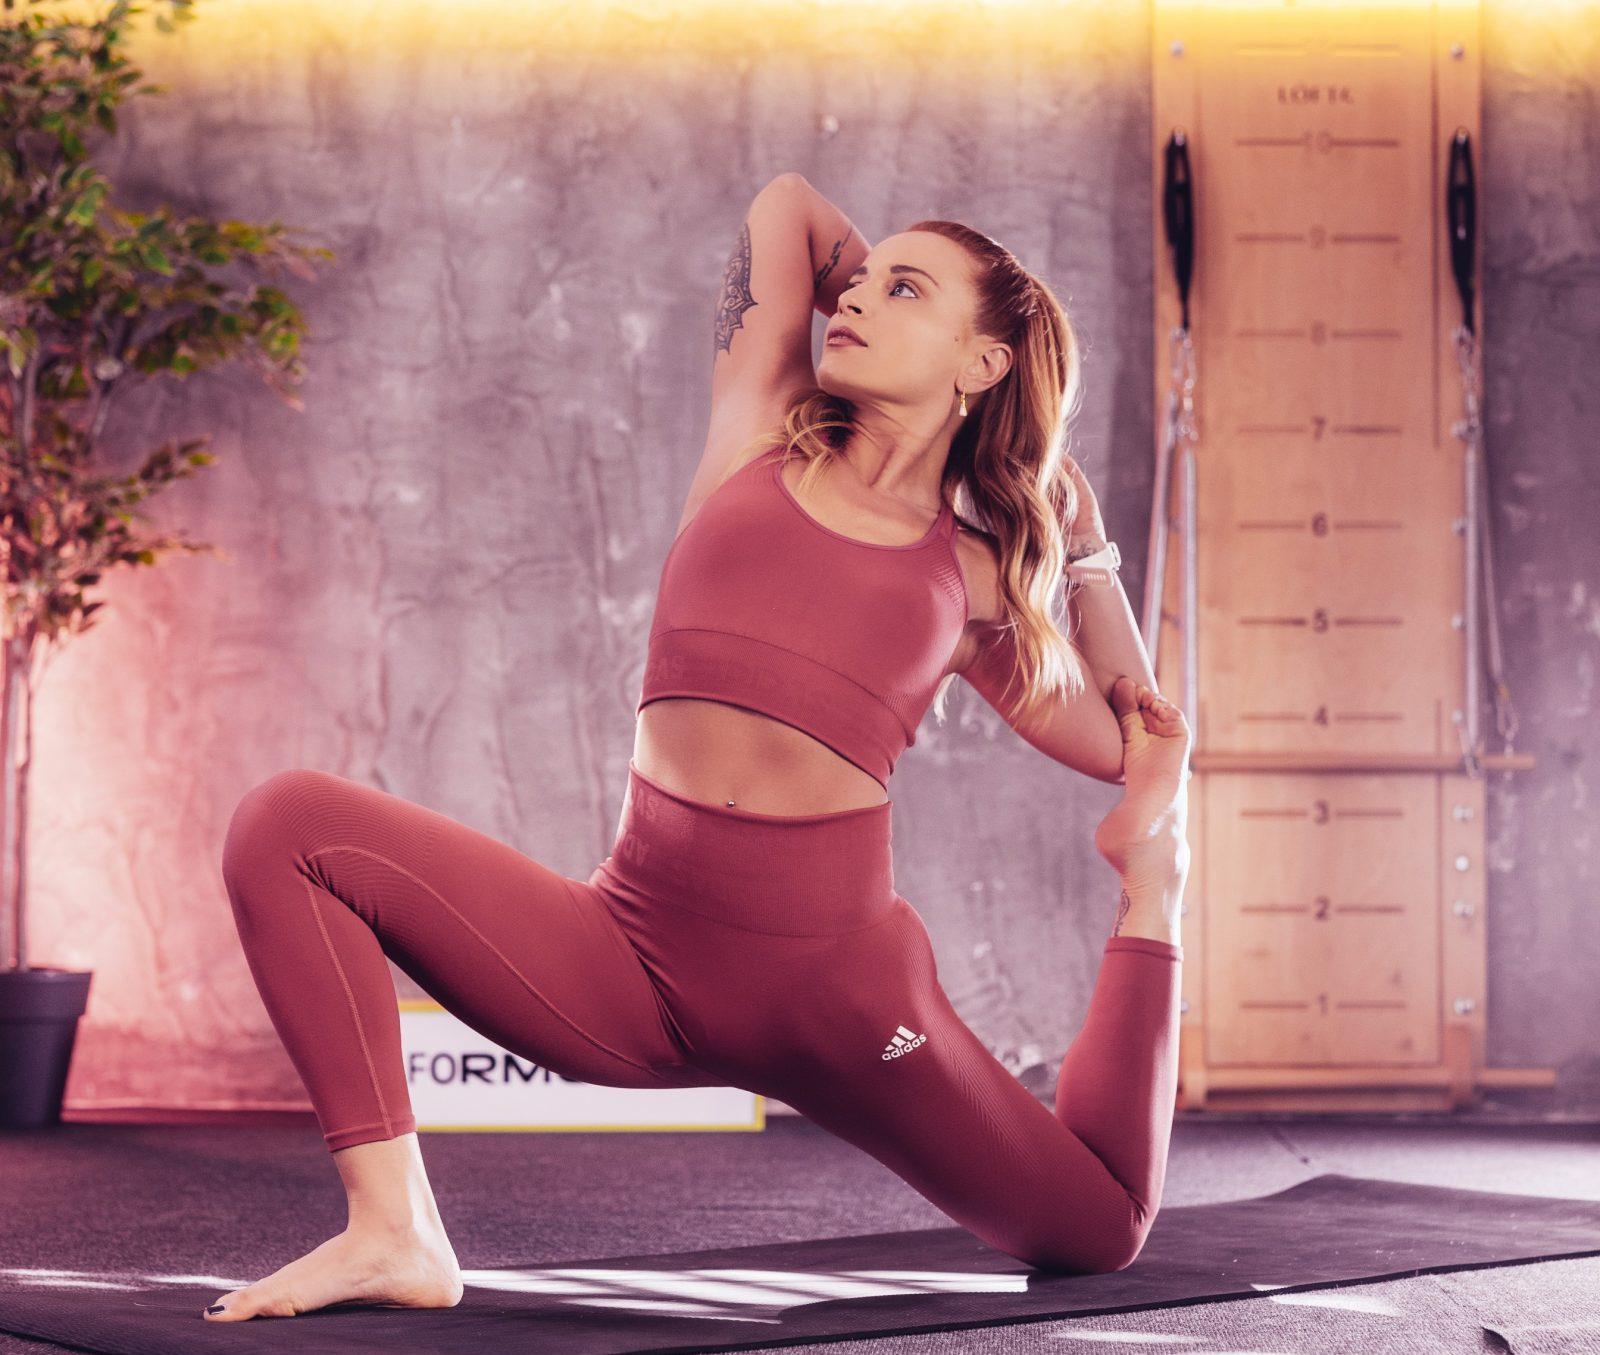 Watch Us Move: Η νέα καμπάνια της adidas στηρίζει όλες τις γυναίκες